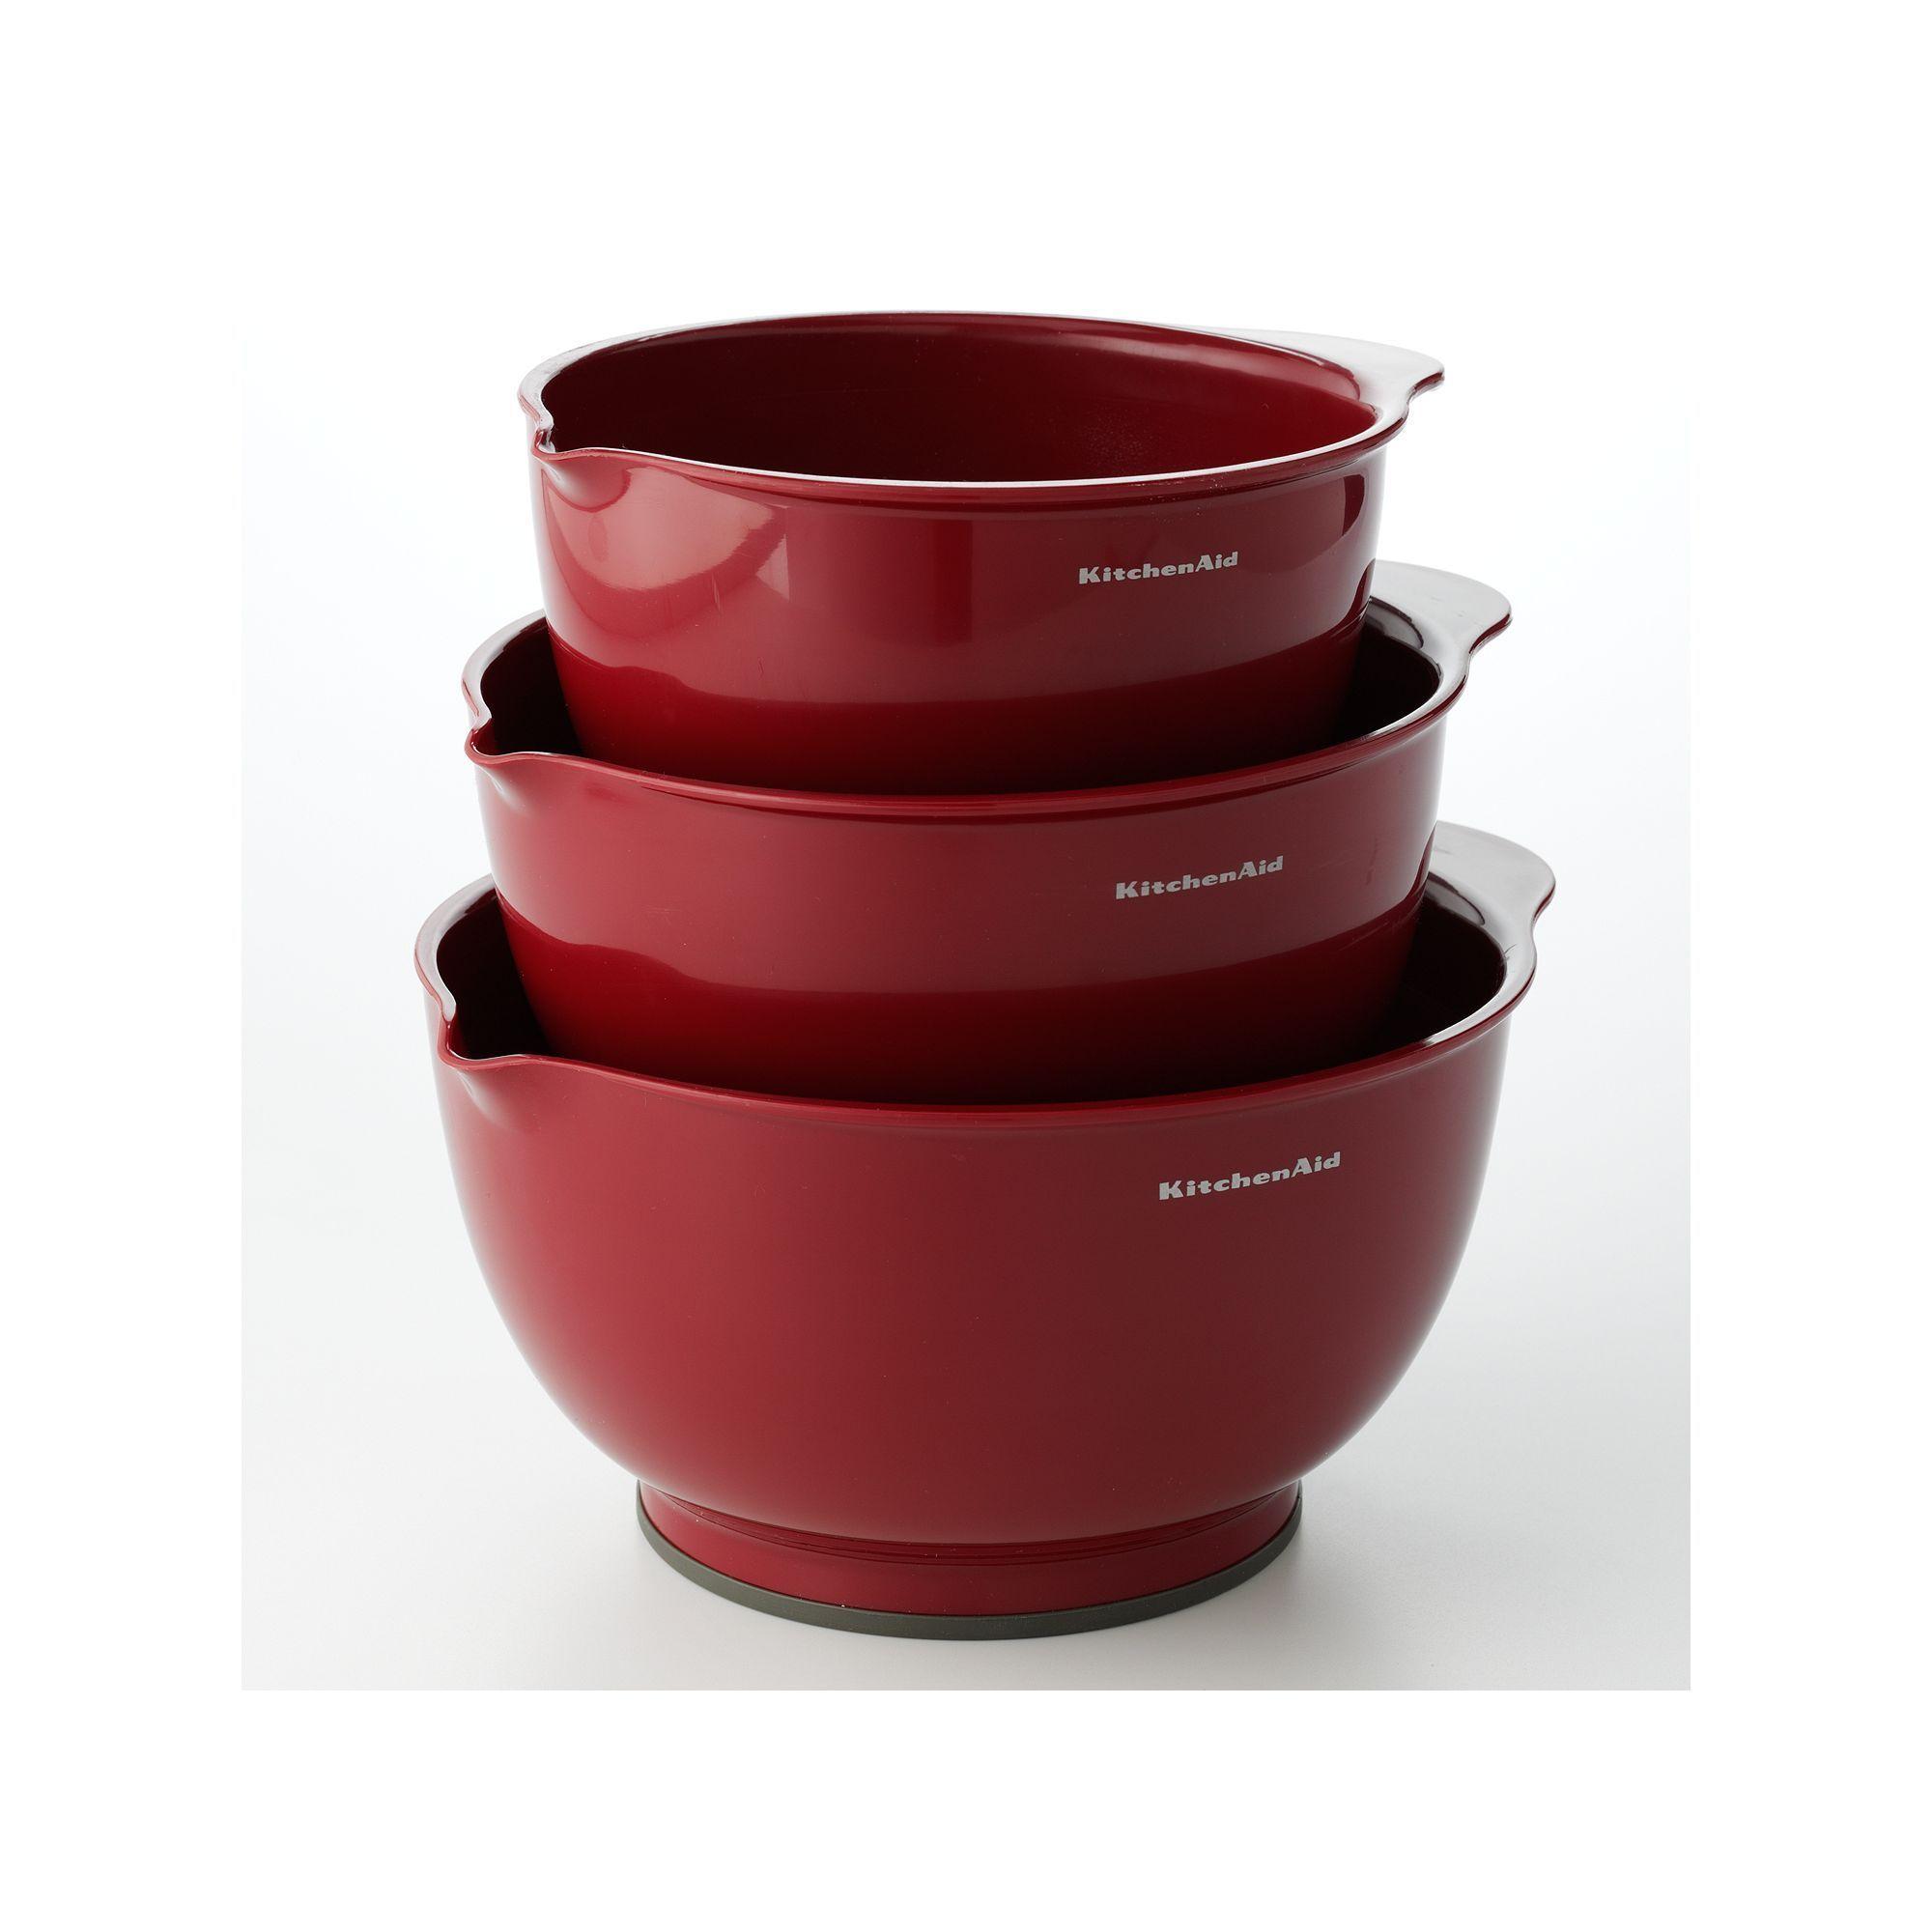 Kitchenaid 3pc mixing bowl set bowl set kitchenaid